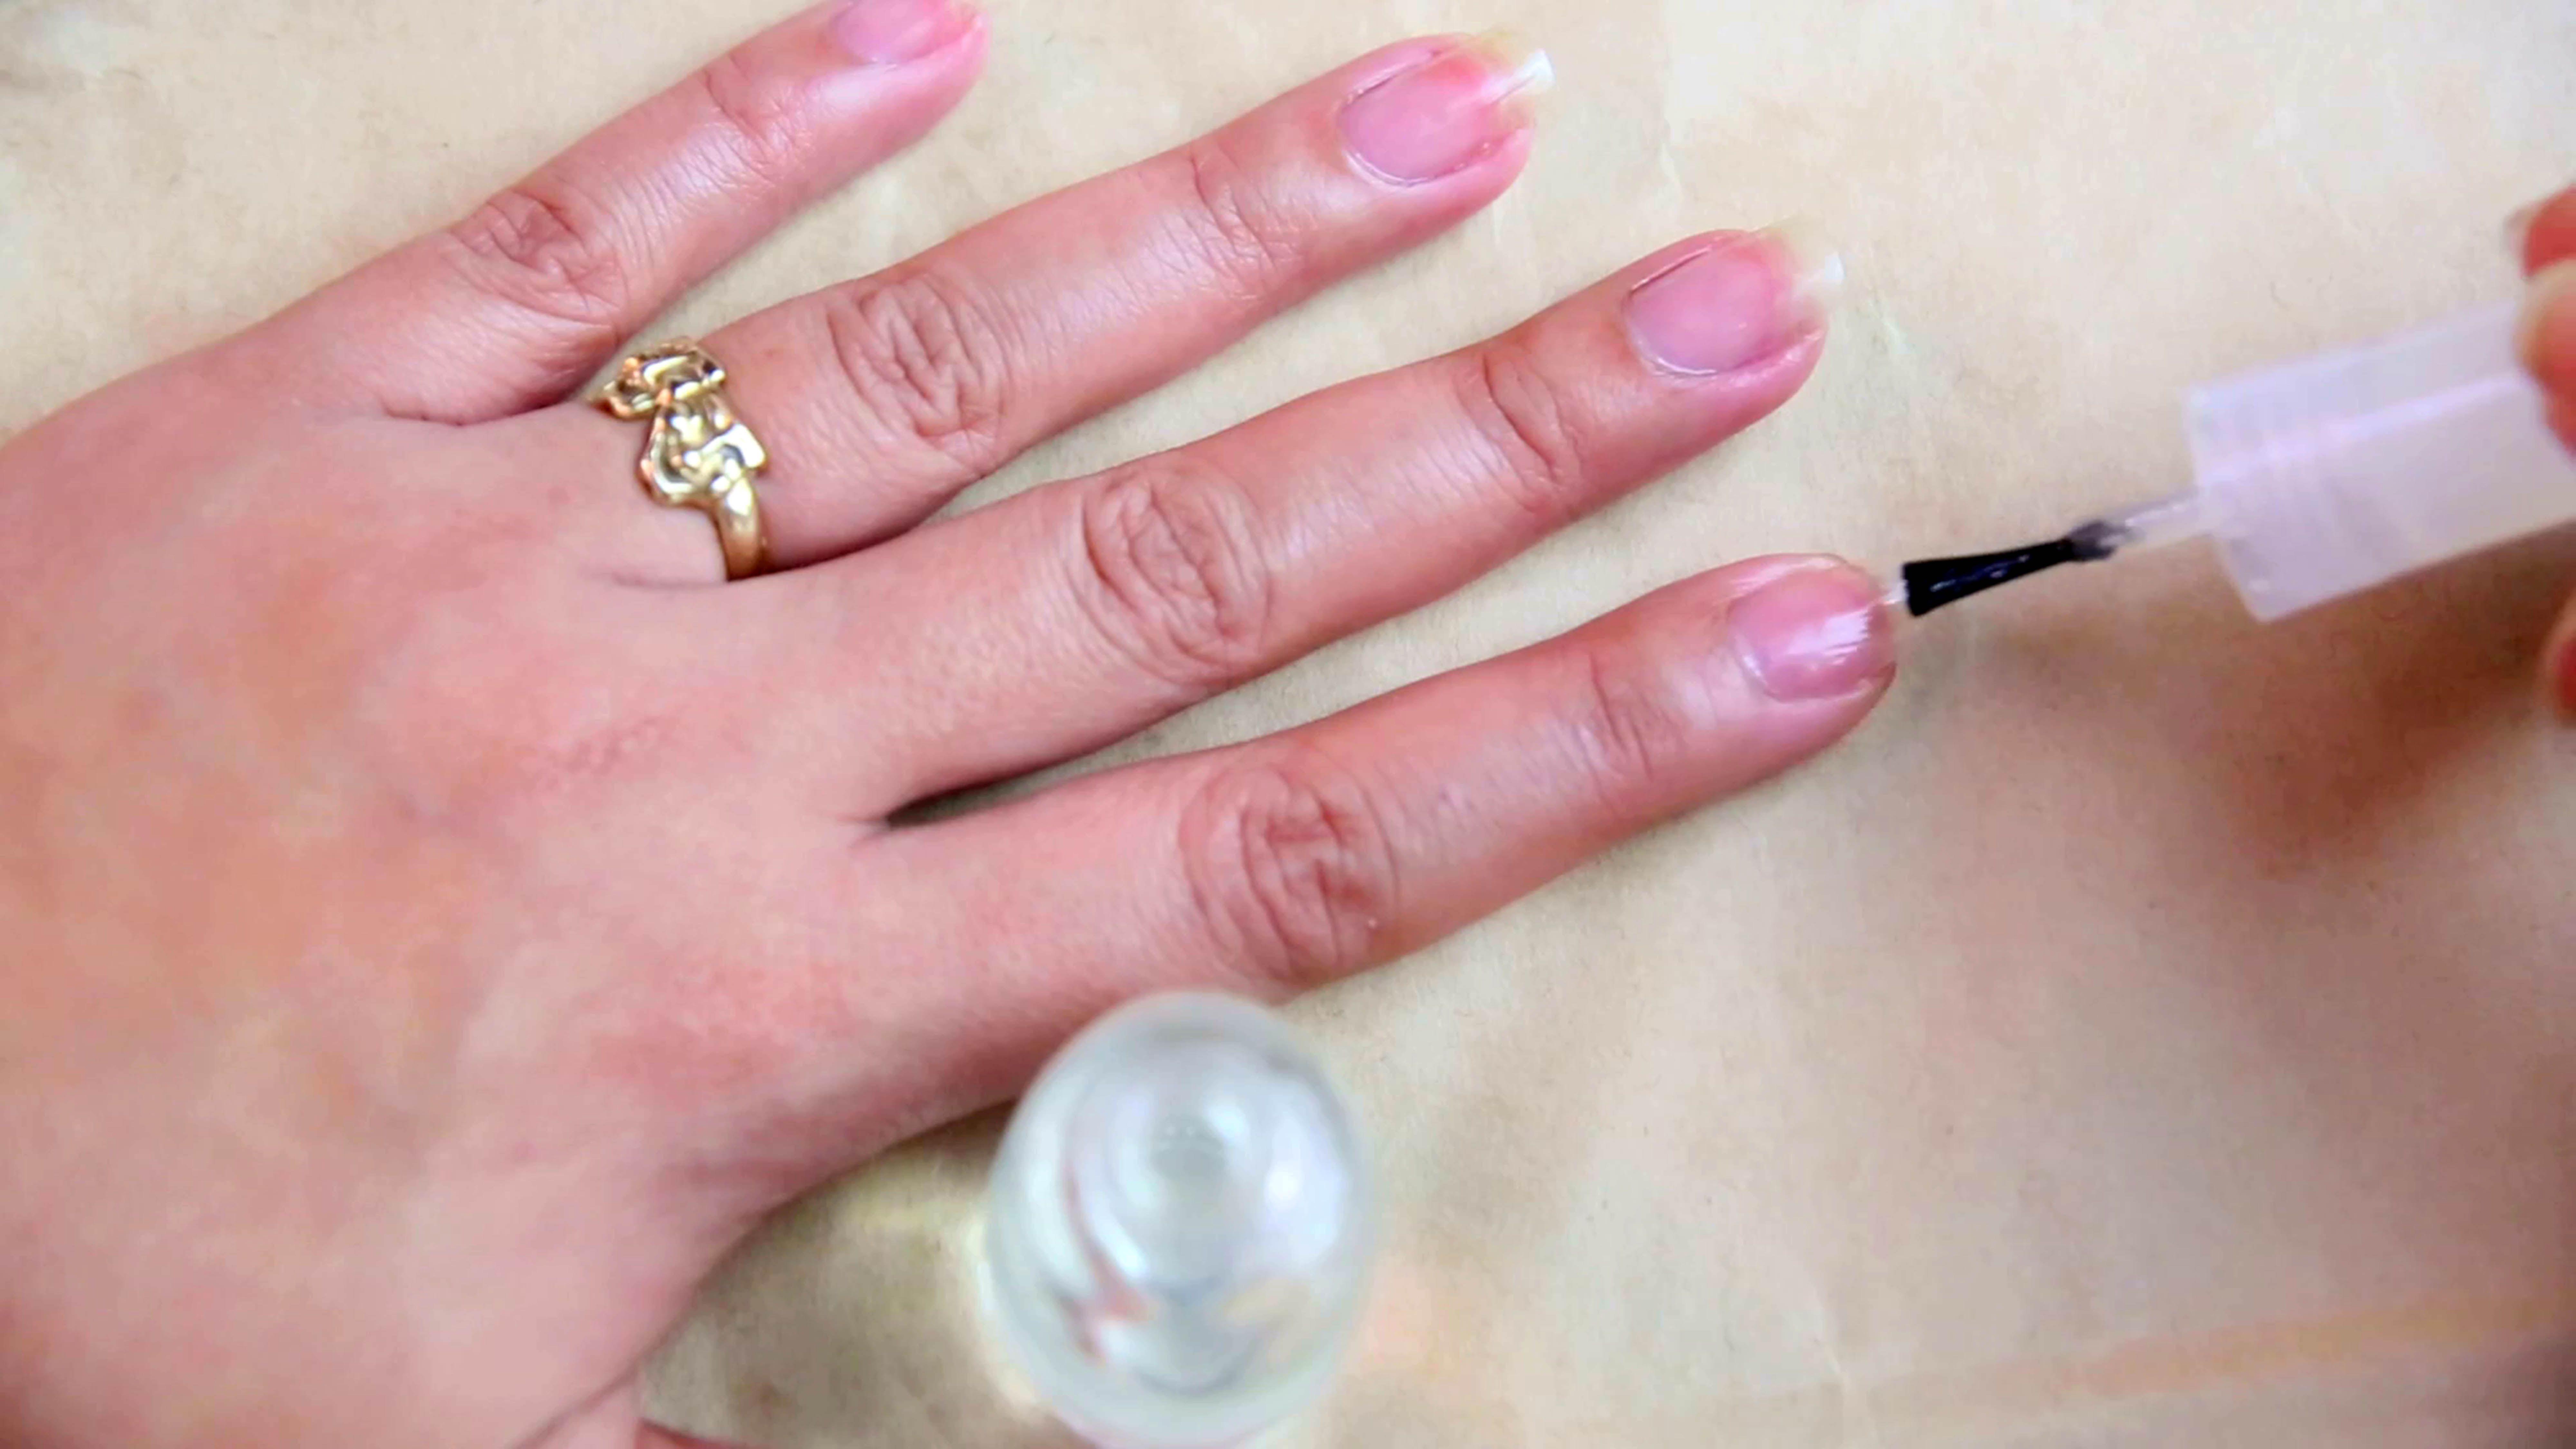 How To Remove Press On Nails Press On Nails Glue On Nails Nail Polish